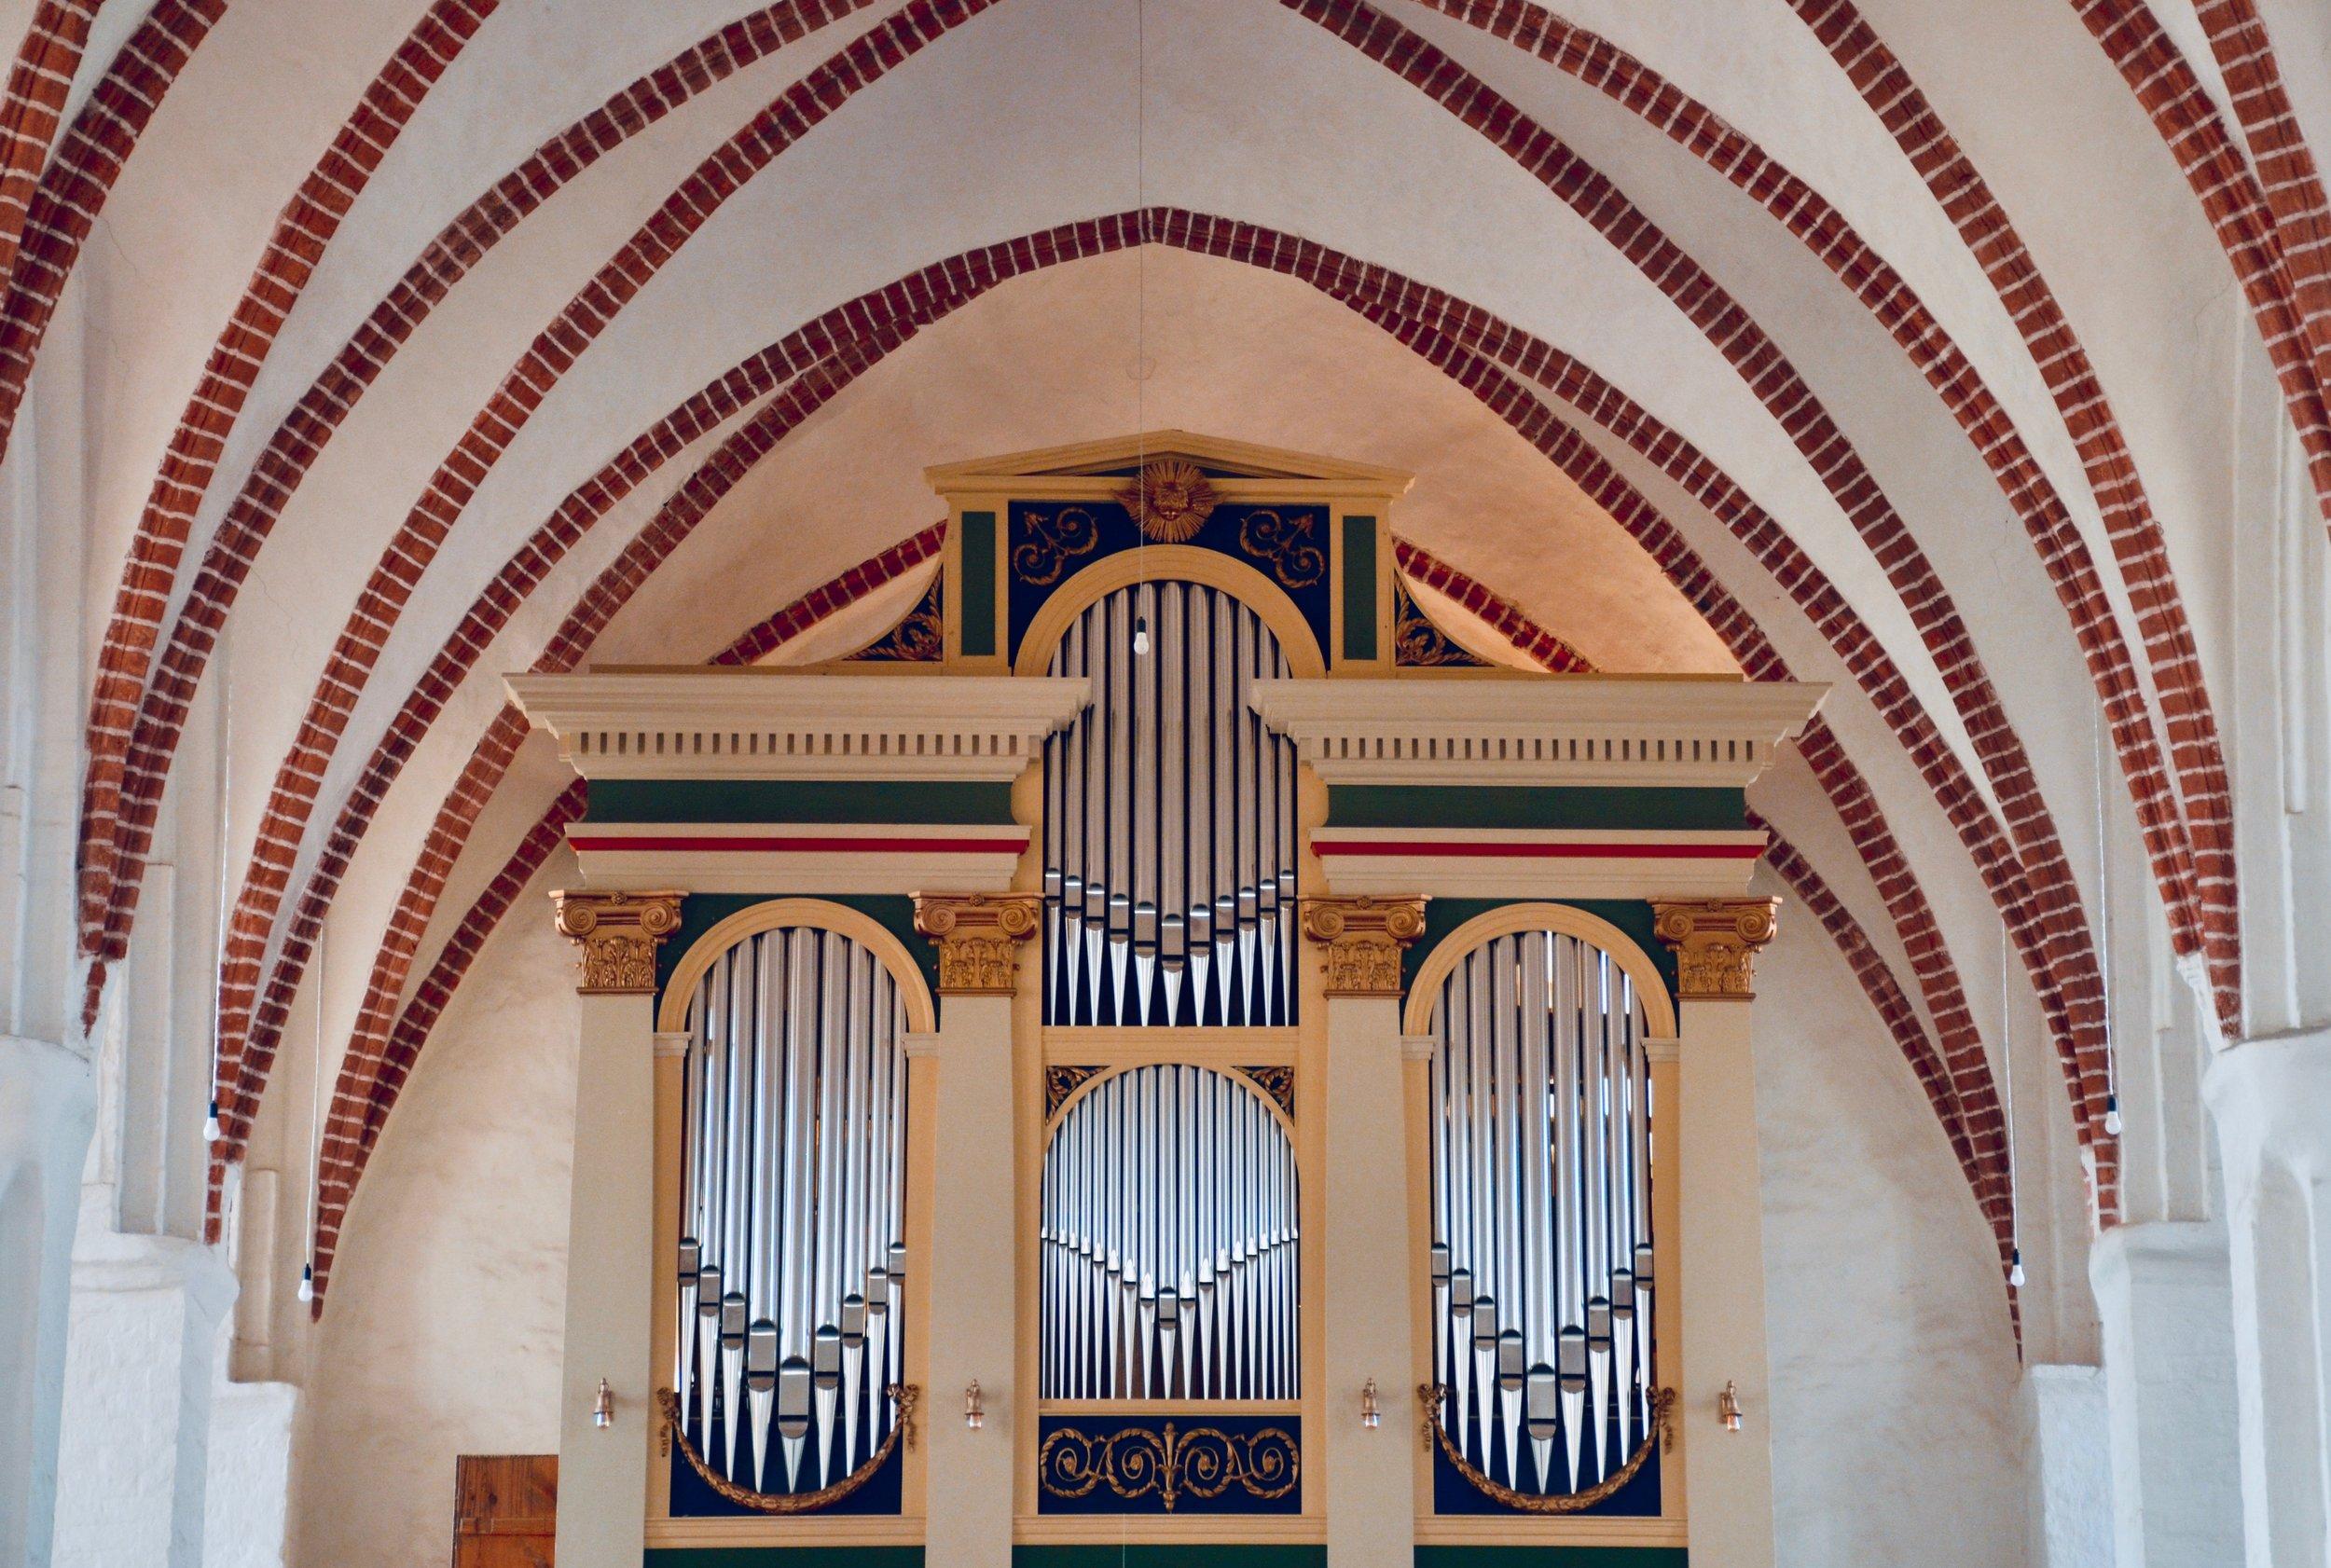 1825 Buchholz organ, St Nicolai, Osterburg.